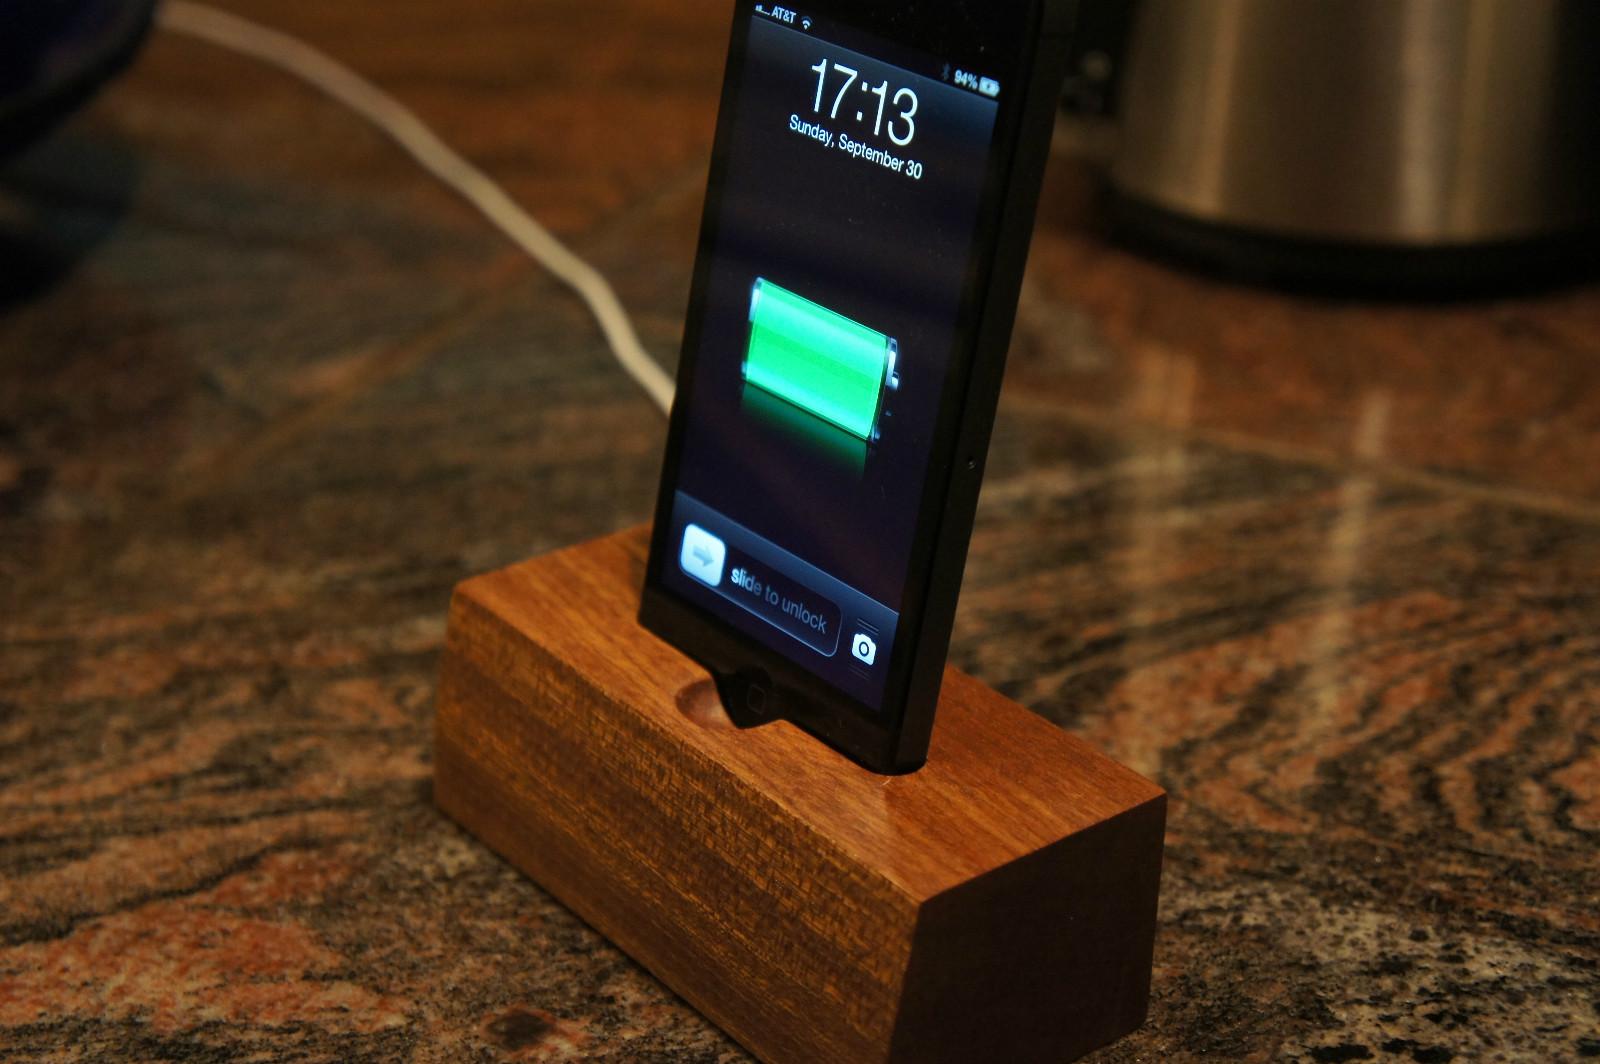 iPHone 5 wood dock on eBay